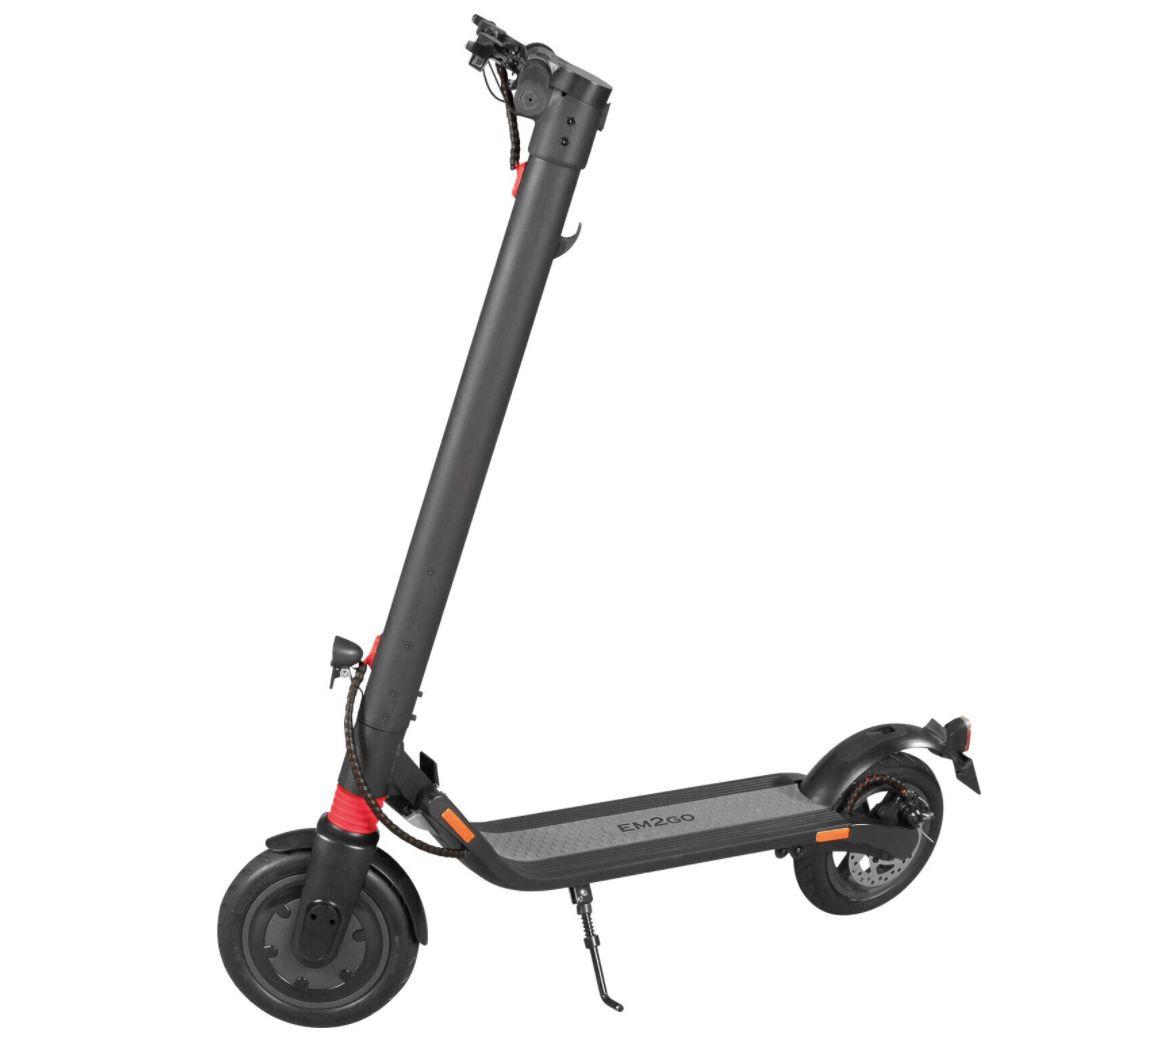 EM2GO E Scooter FW106ST P mit Straßenzulassung inkl. wechselbarem 6,4Ah Akku für 449,99€ (statt 534€)